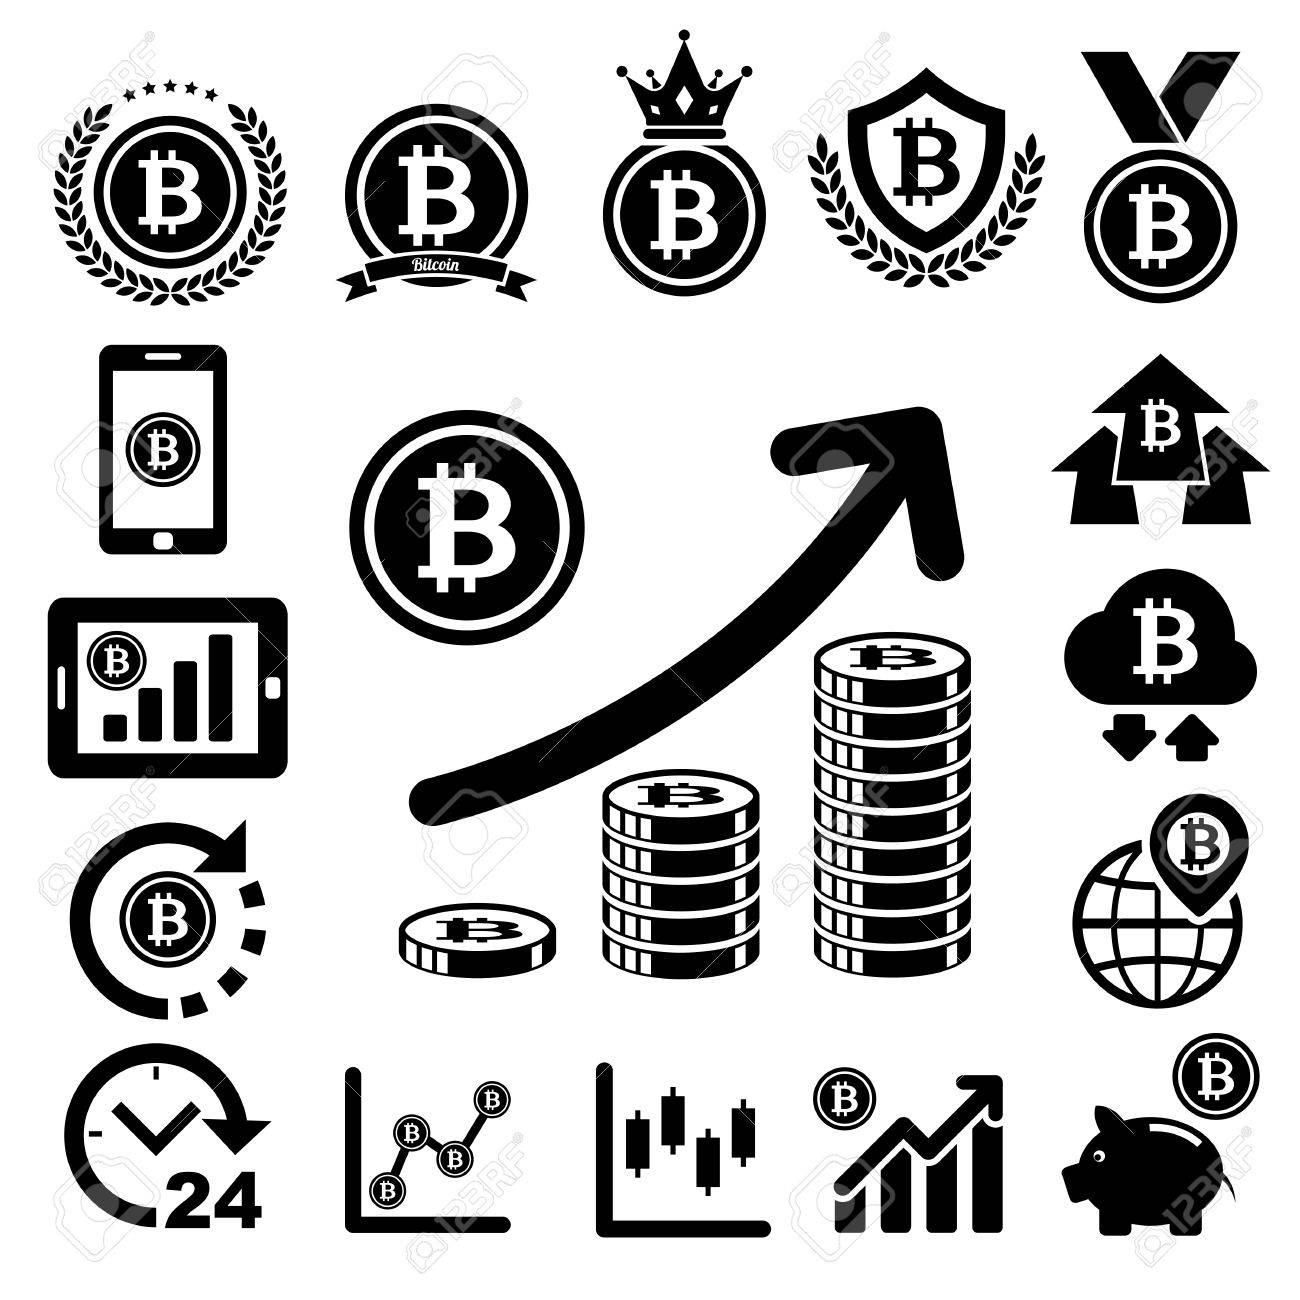 Bit coin icons set. - 26068788